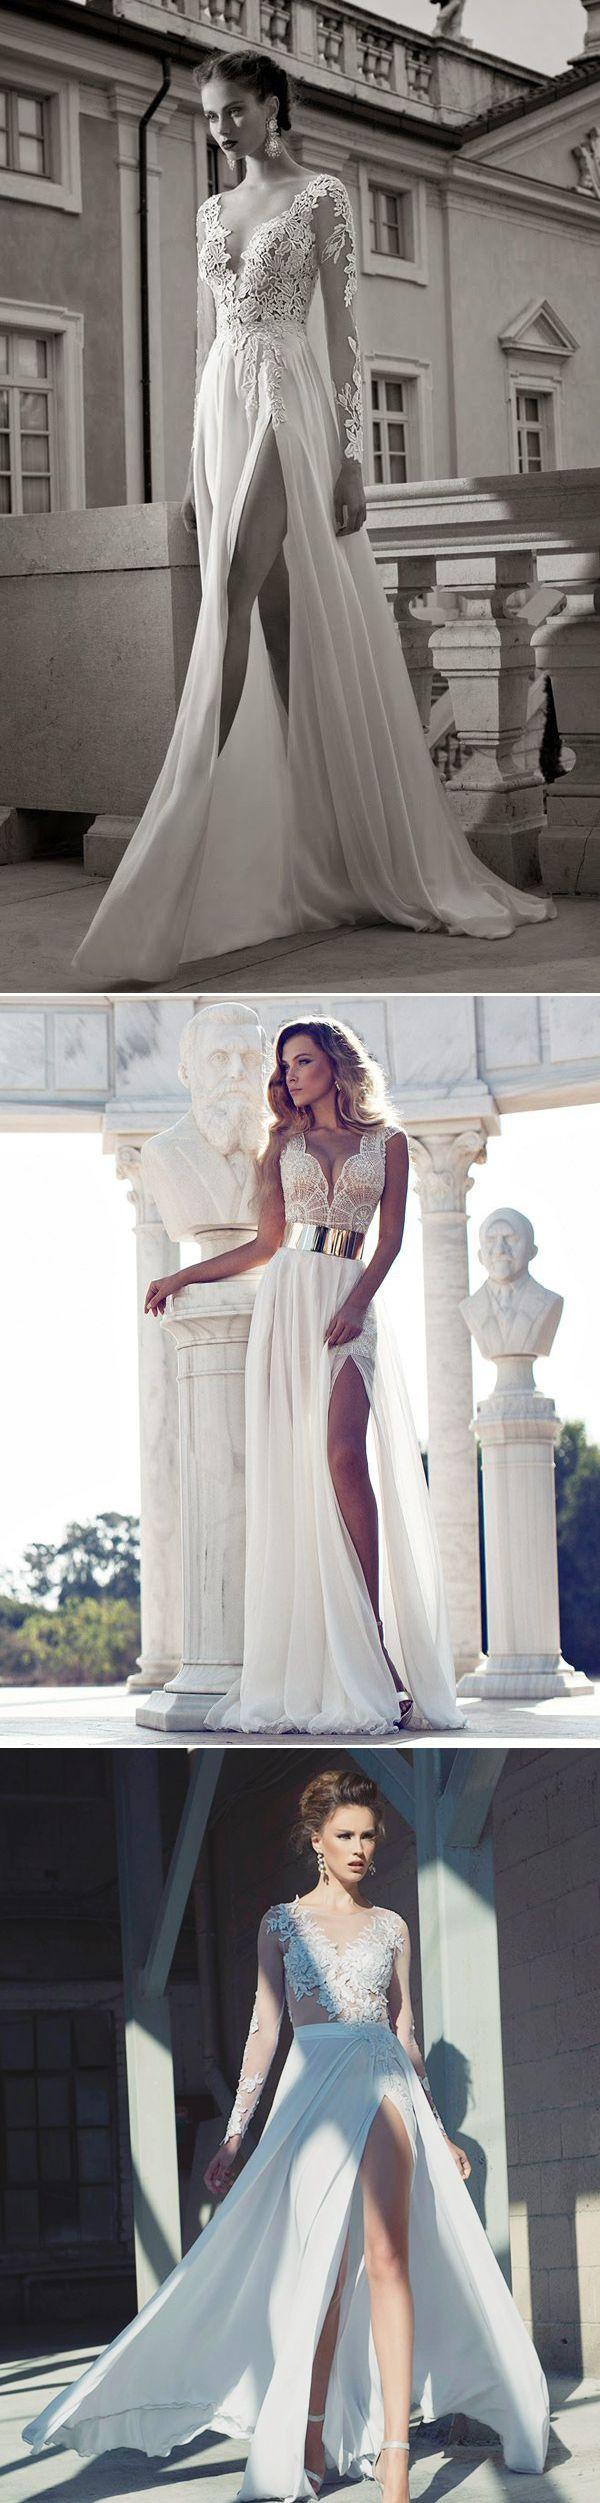 Wedding Dresses 2016 Trends: High Slit Bridal Gowns ! | http://www.deerpearlflowers.com/wedding-dresses-2016-trends-high-slit-bridal-gowns/